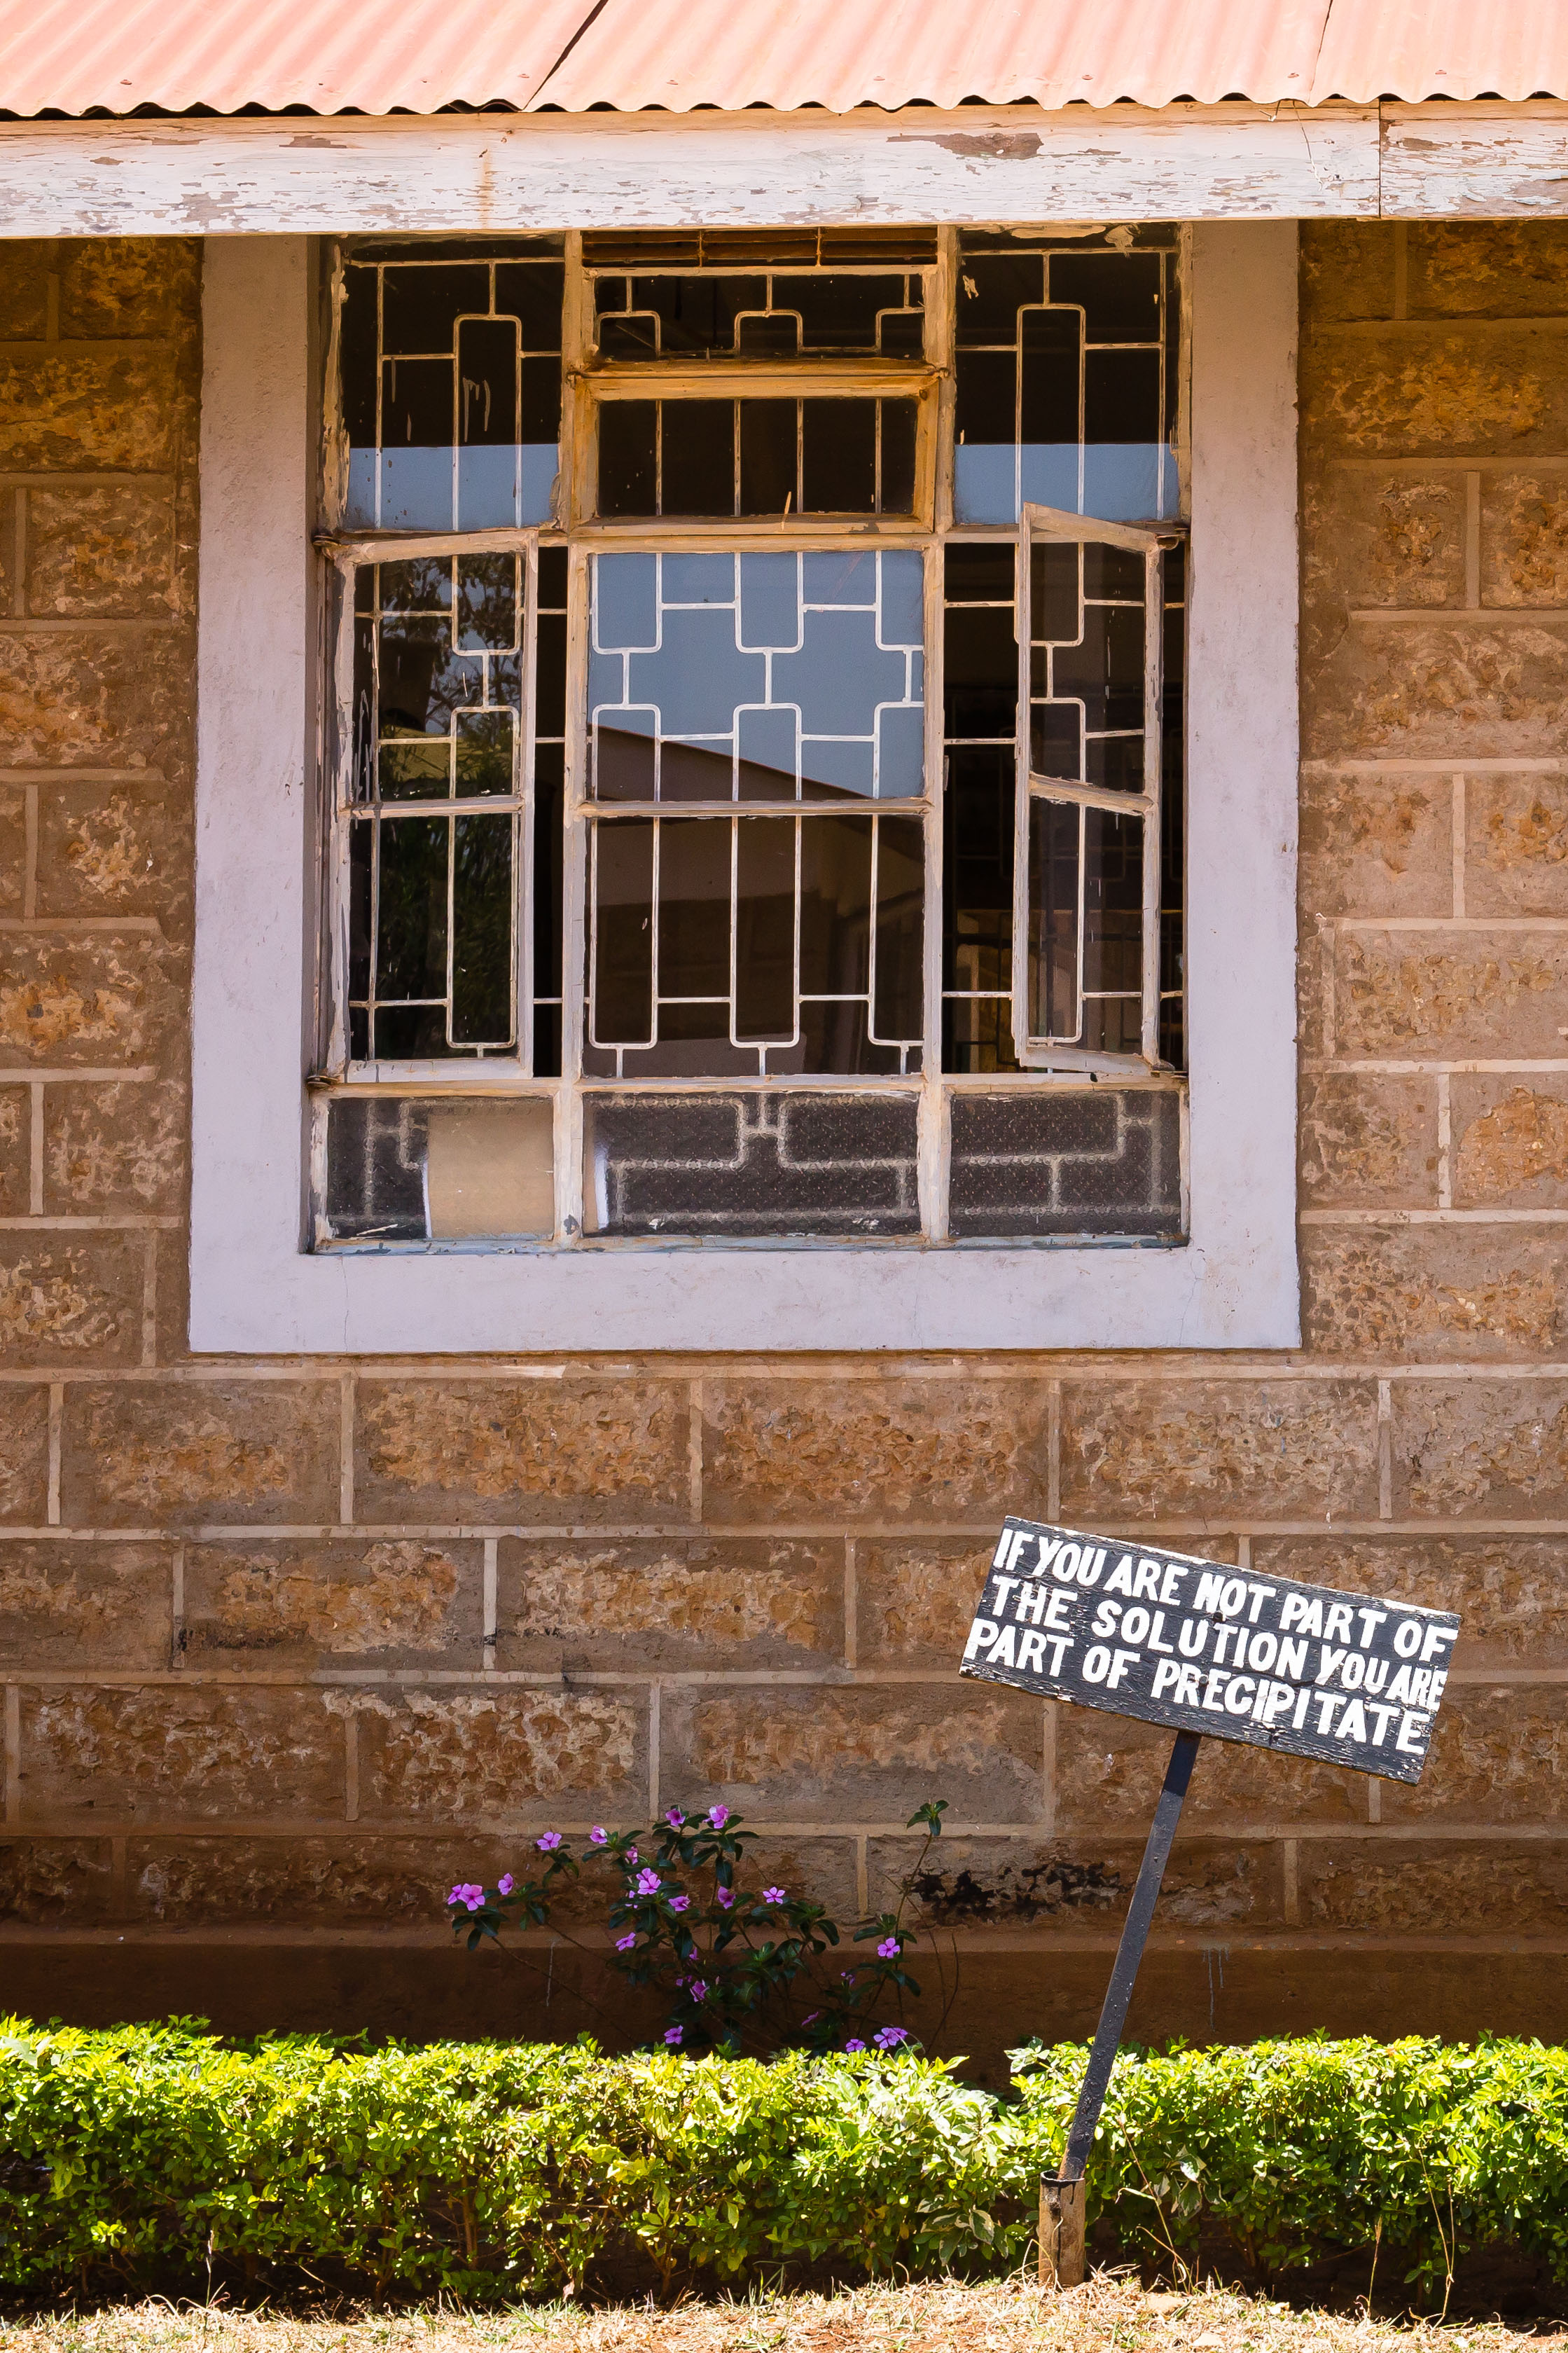 Seen Outside the Chemistry Lab, St. Mary's High School, Igoji, Kenya